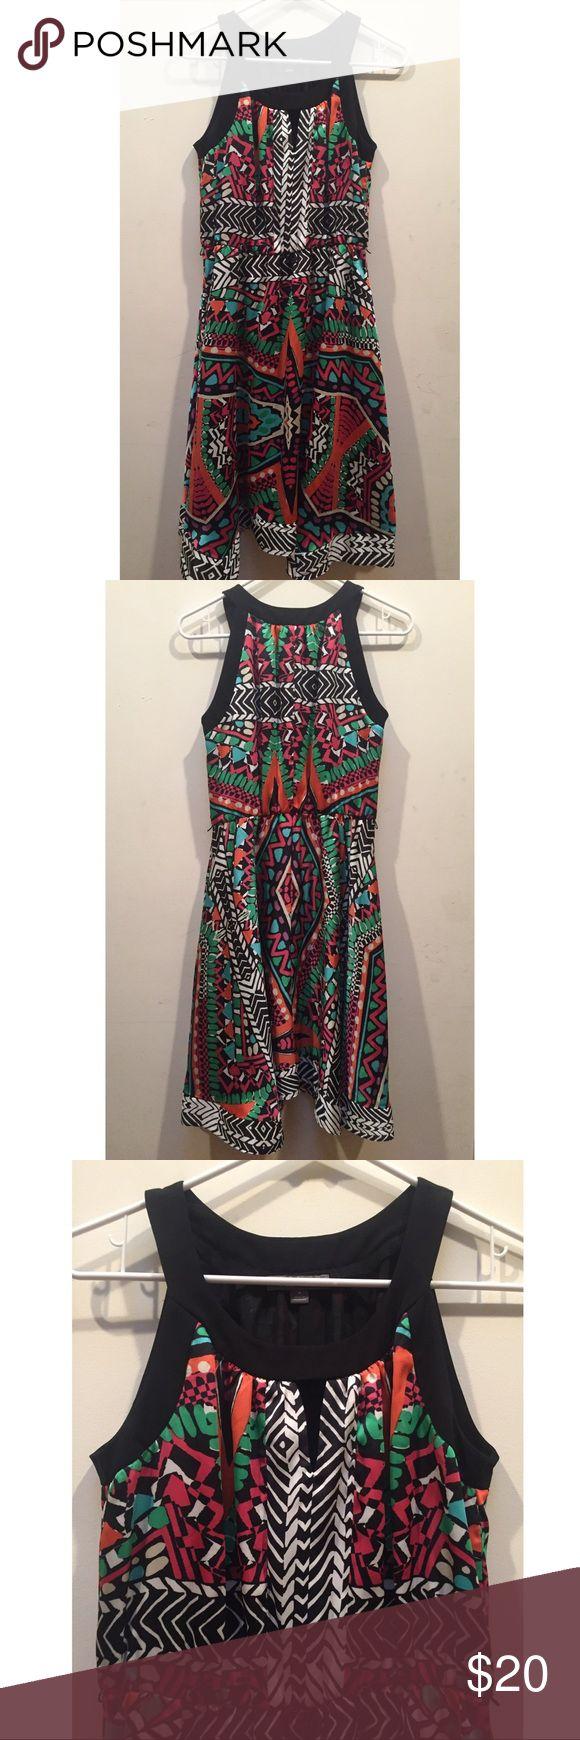 ☀️EUC Roz & Ali Colorful Tribal Geometric Dress Roz & Ali Colorful Tribal Geometric Dress in excellent used condition, size 4 Roz & Ali Dresses Midi